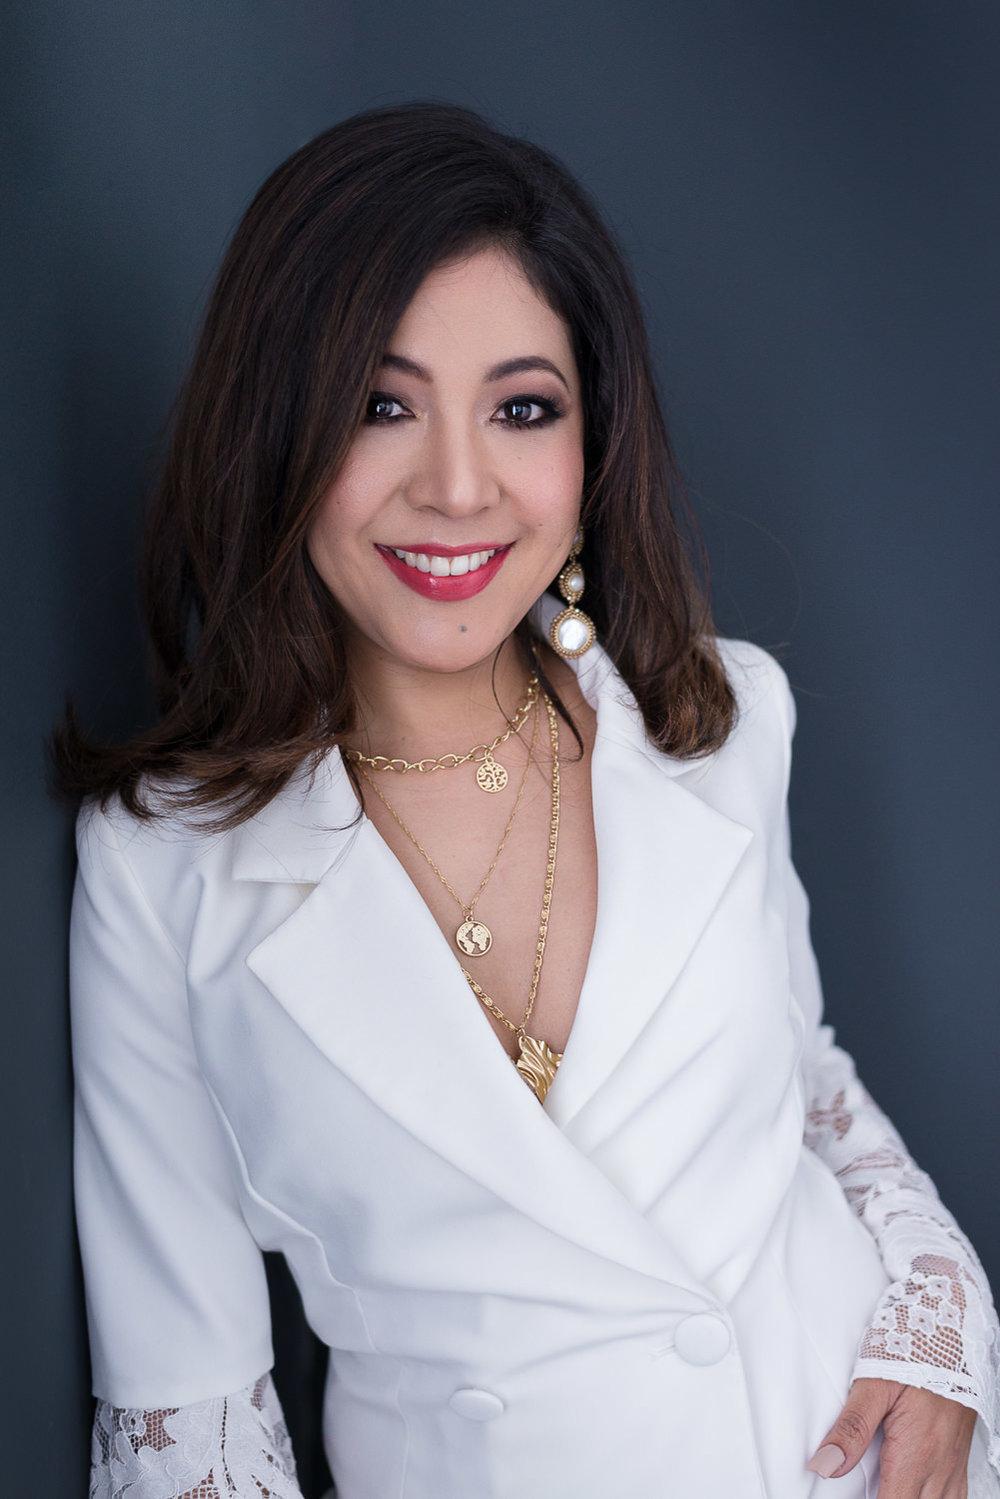 Pamela Lee-Melissa Alcantar Fotografia Sesión de fotos